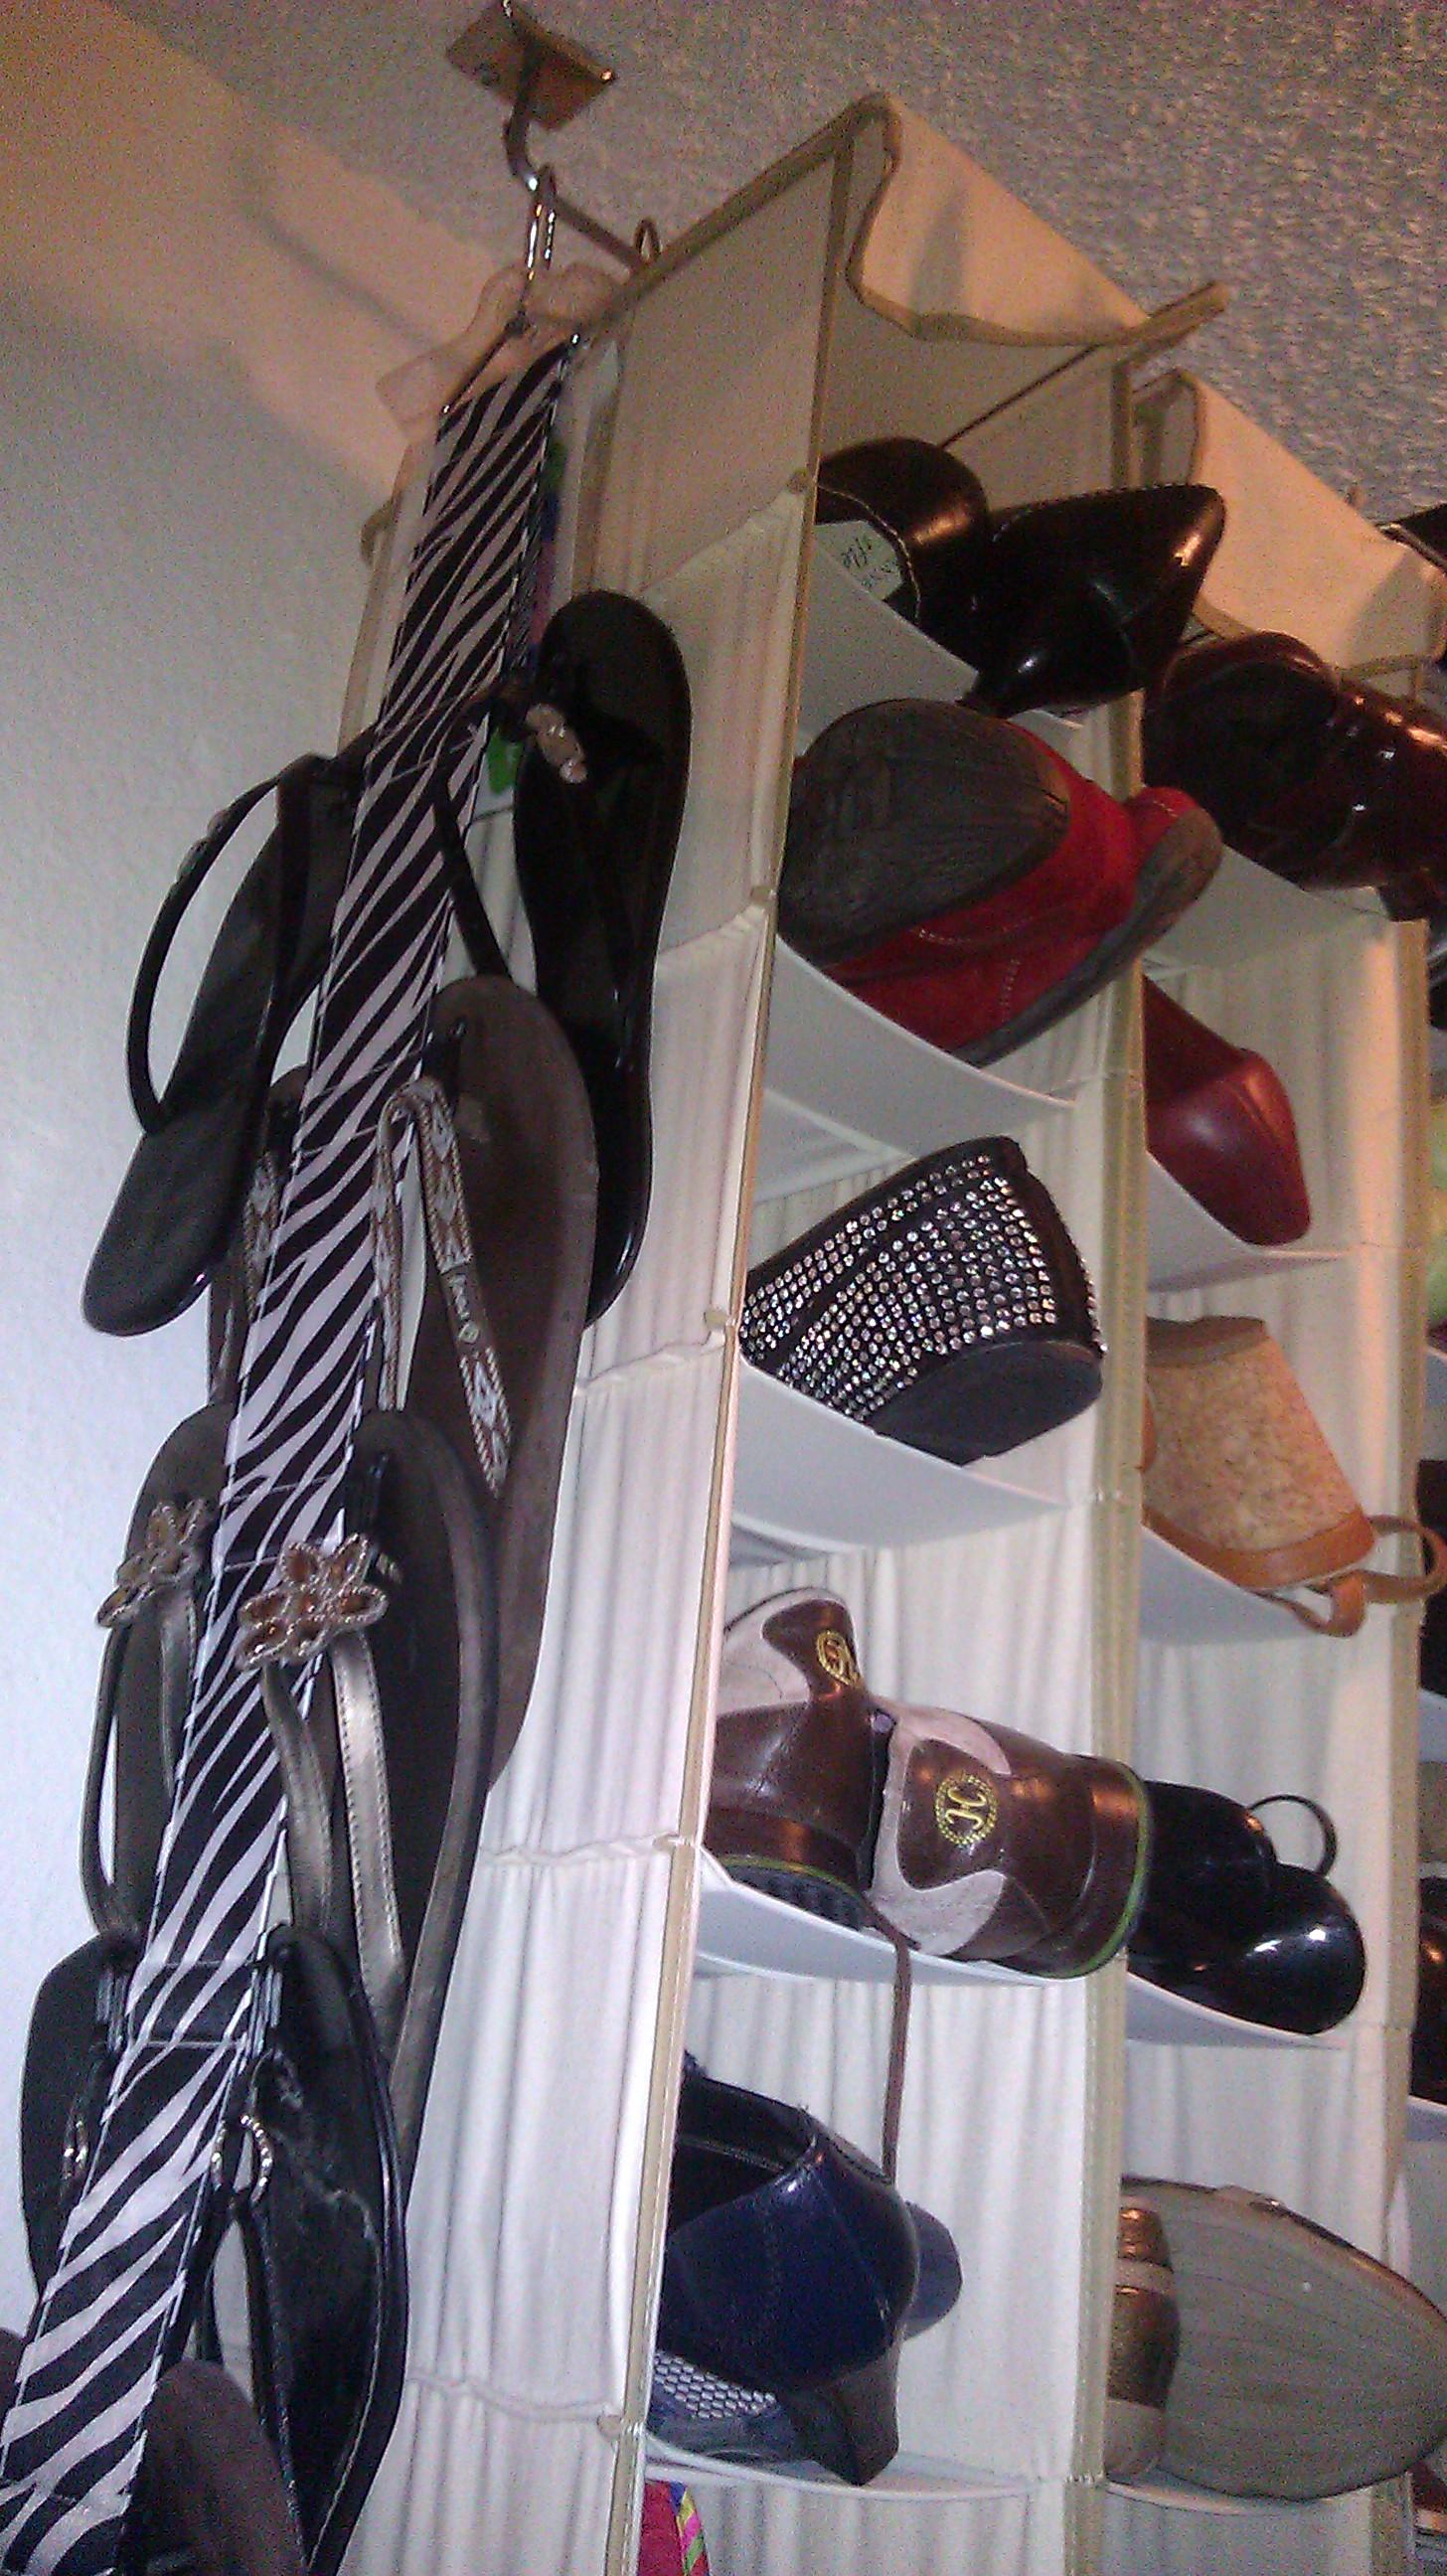 Shoe Storage Goes Vertical